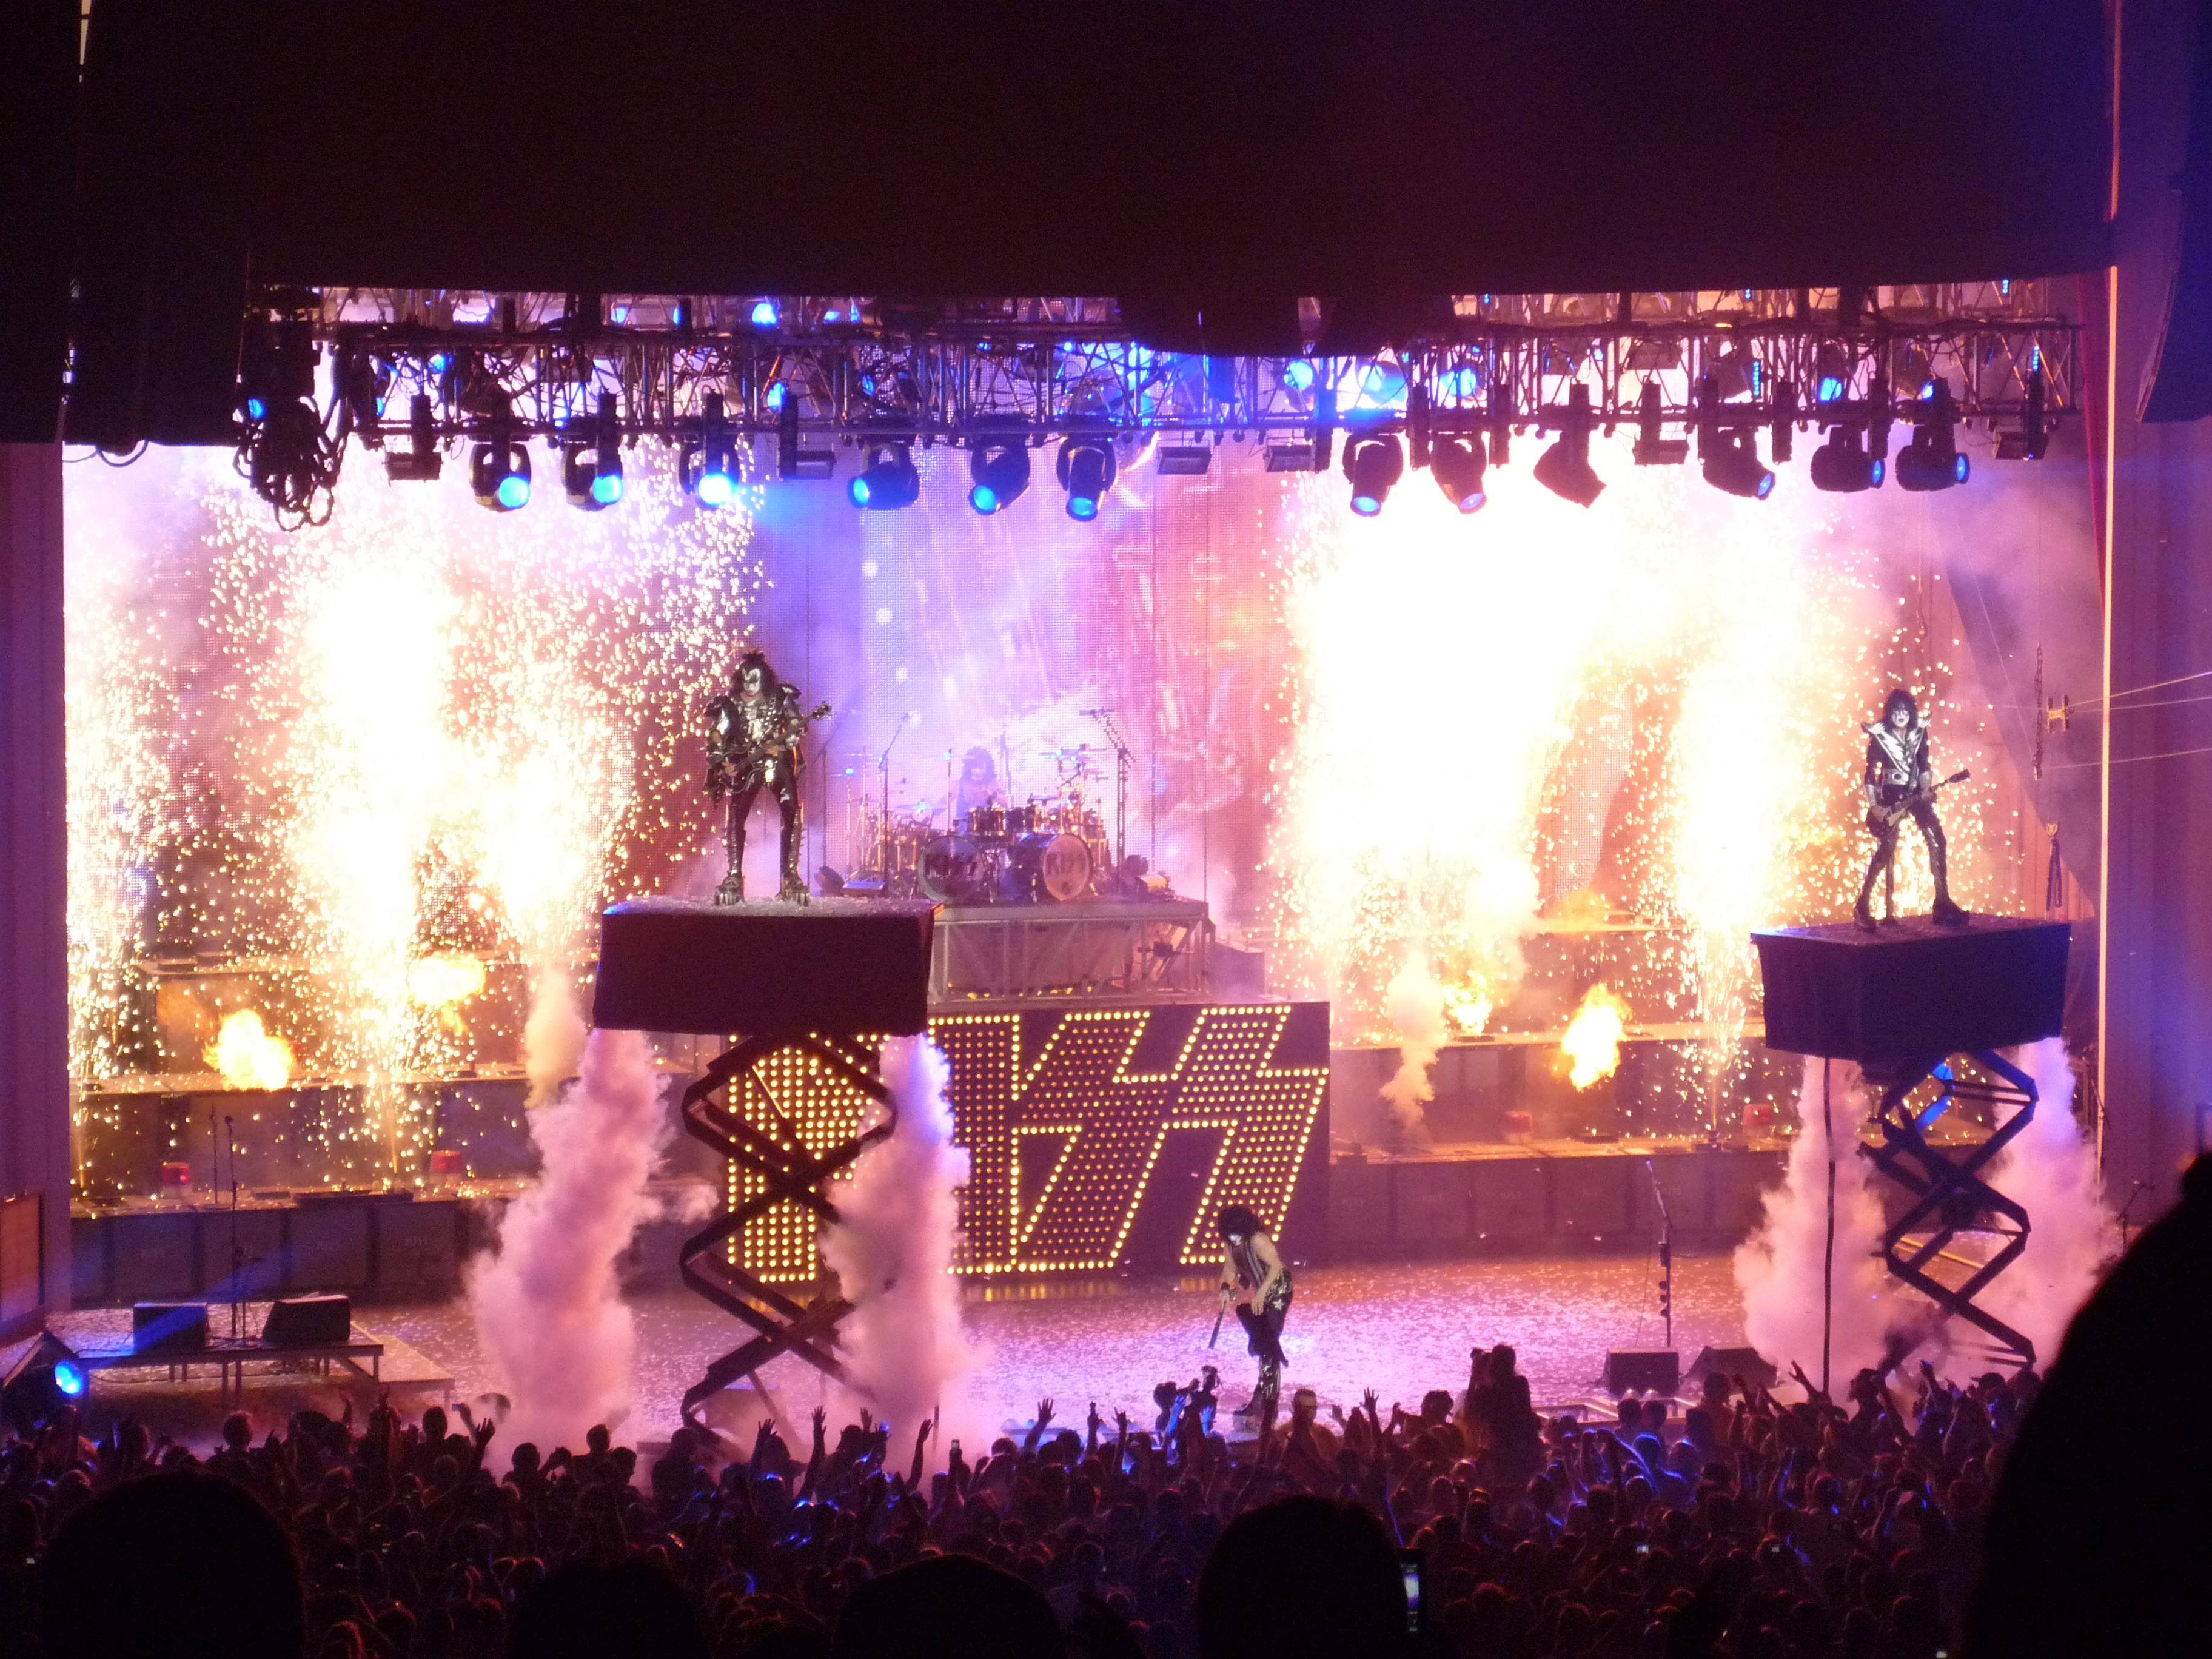 Kiss heavy metal rock bands concert f wallpaper background 3648x2736